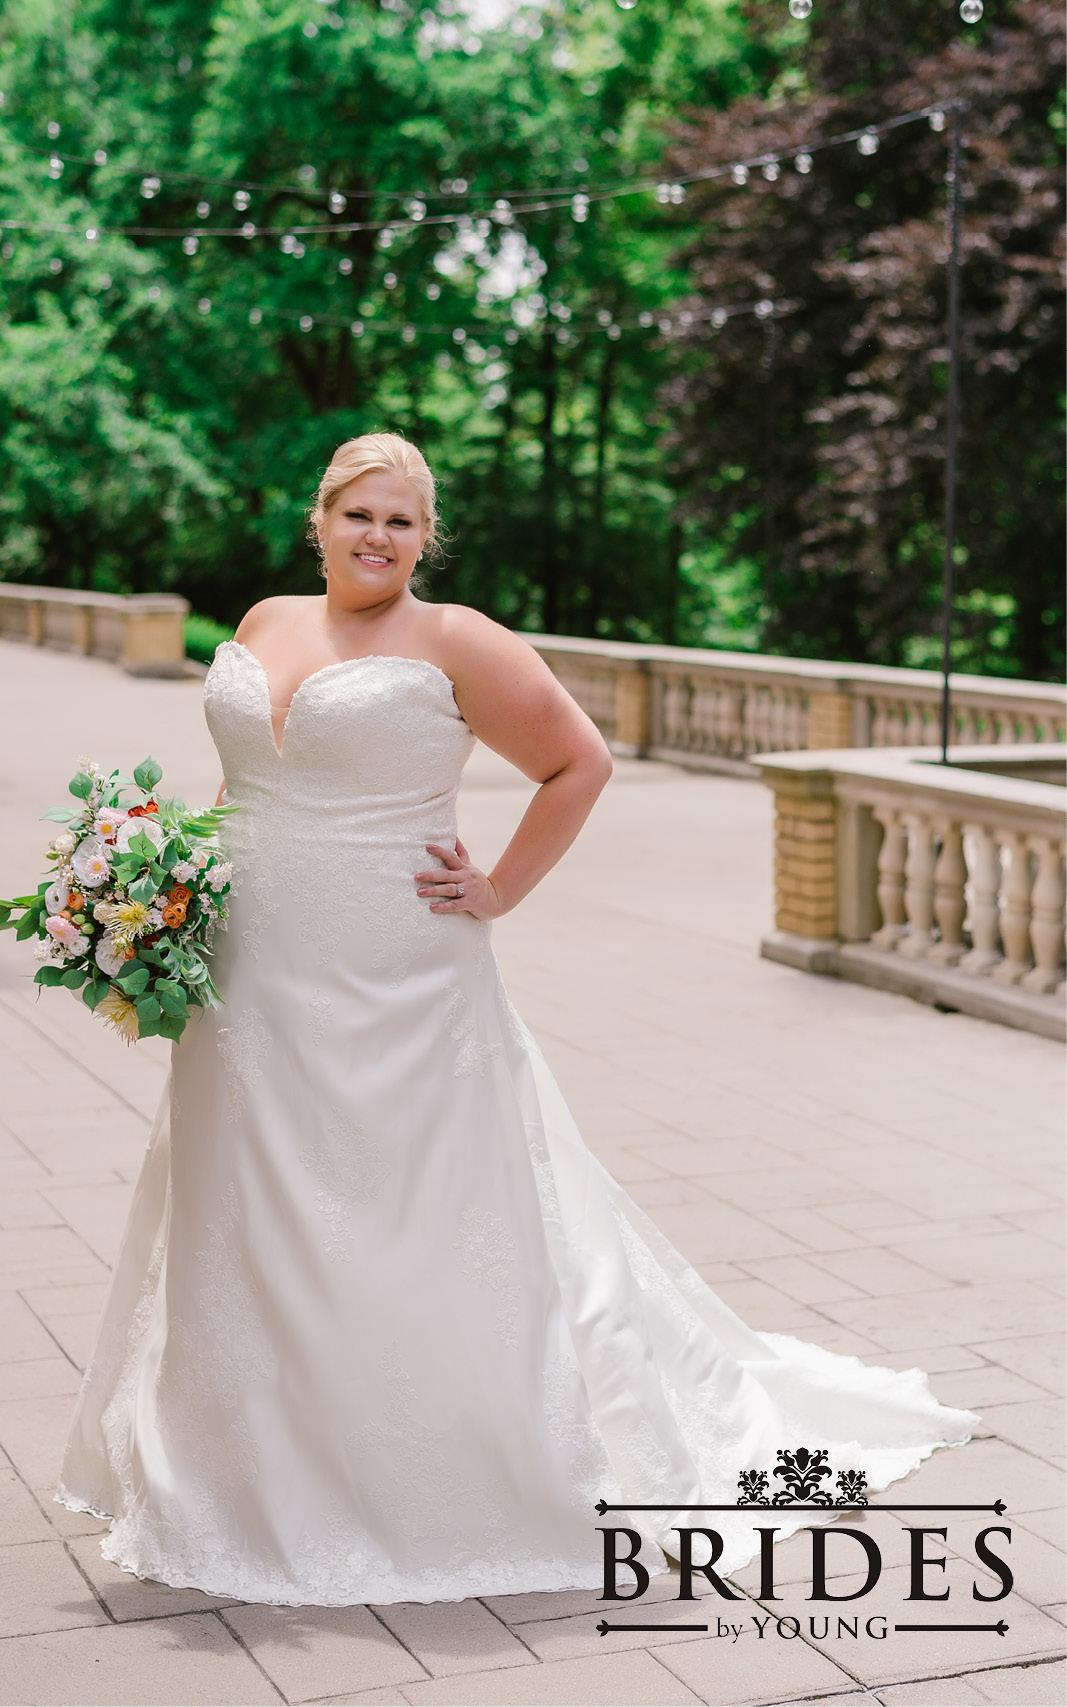 BridesbyYoung-2020Collection-PlusSizeBridalBoutique-CurvyWeddingDressInspiration-204.jpg